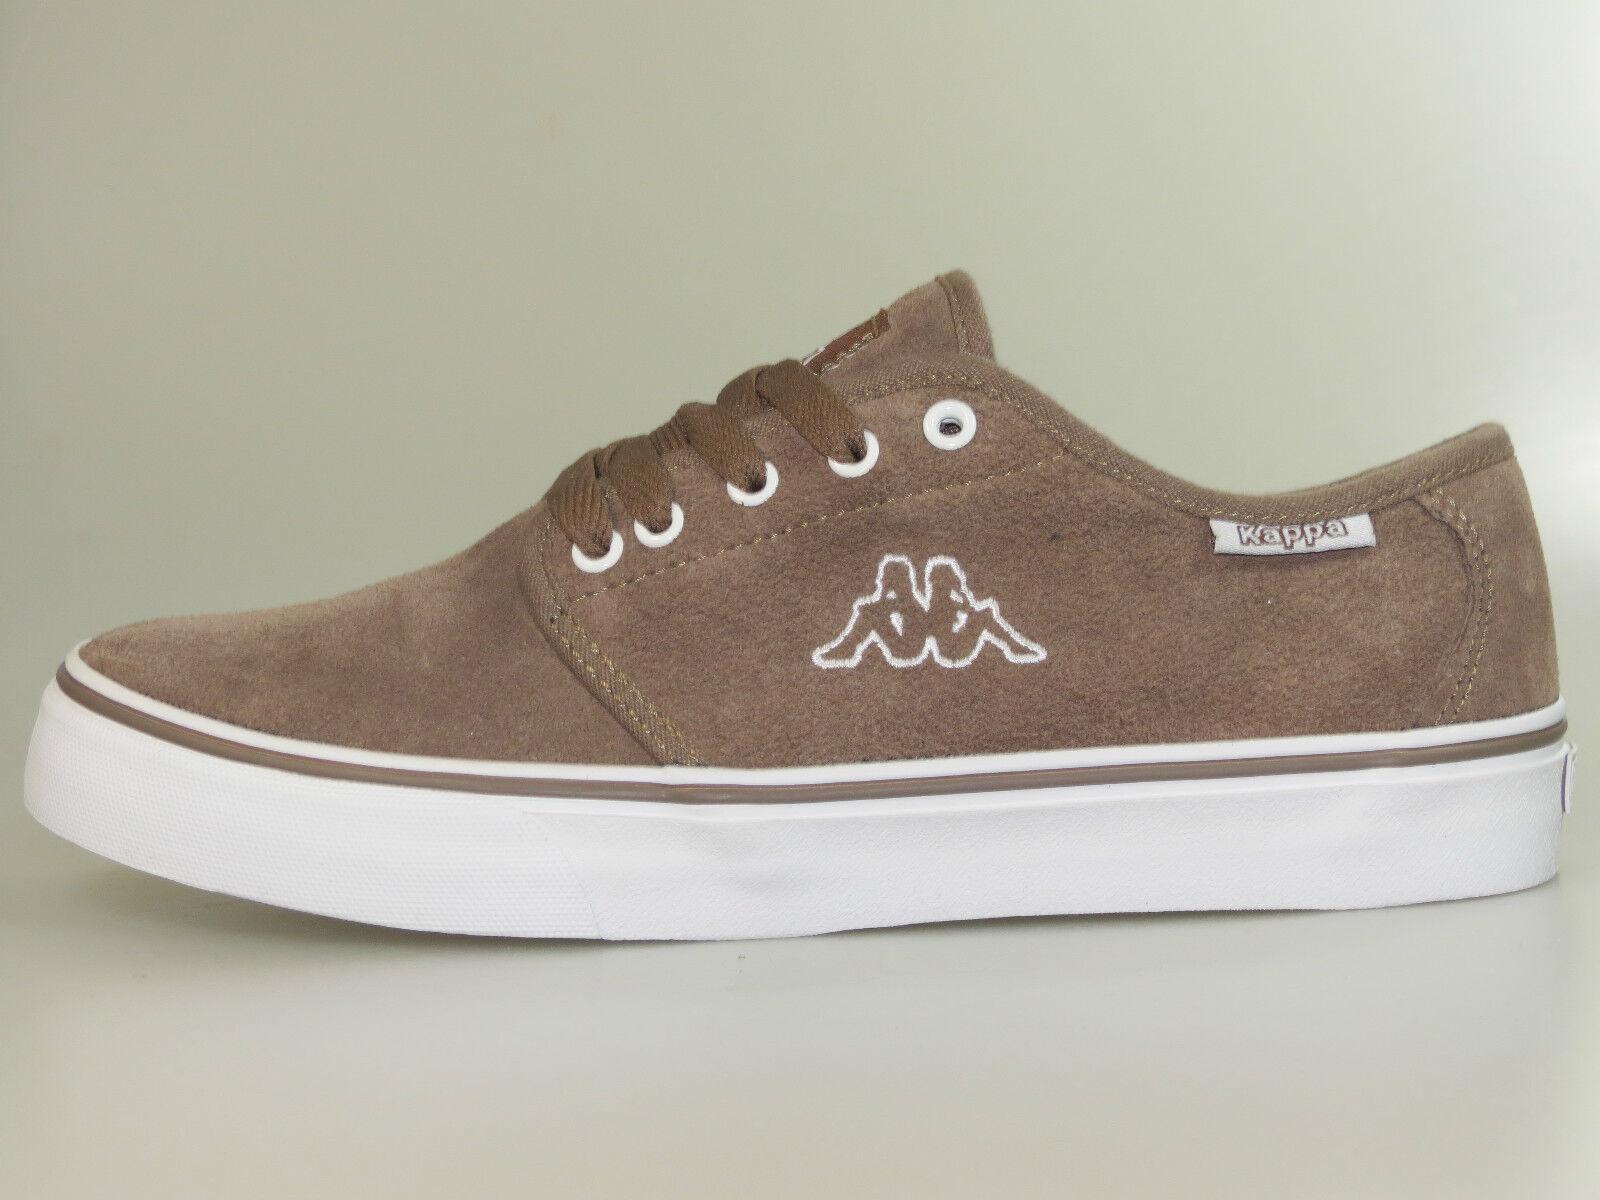 Kappa Schuhe Jumbo Low 241537/5210 Braun Weiß Leder +Neu+ verschiedene Größen